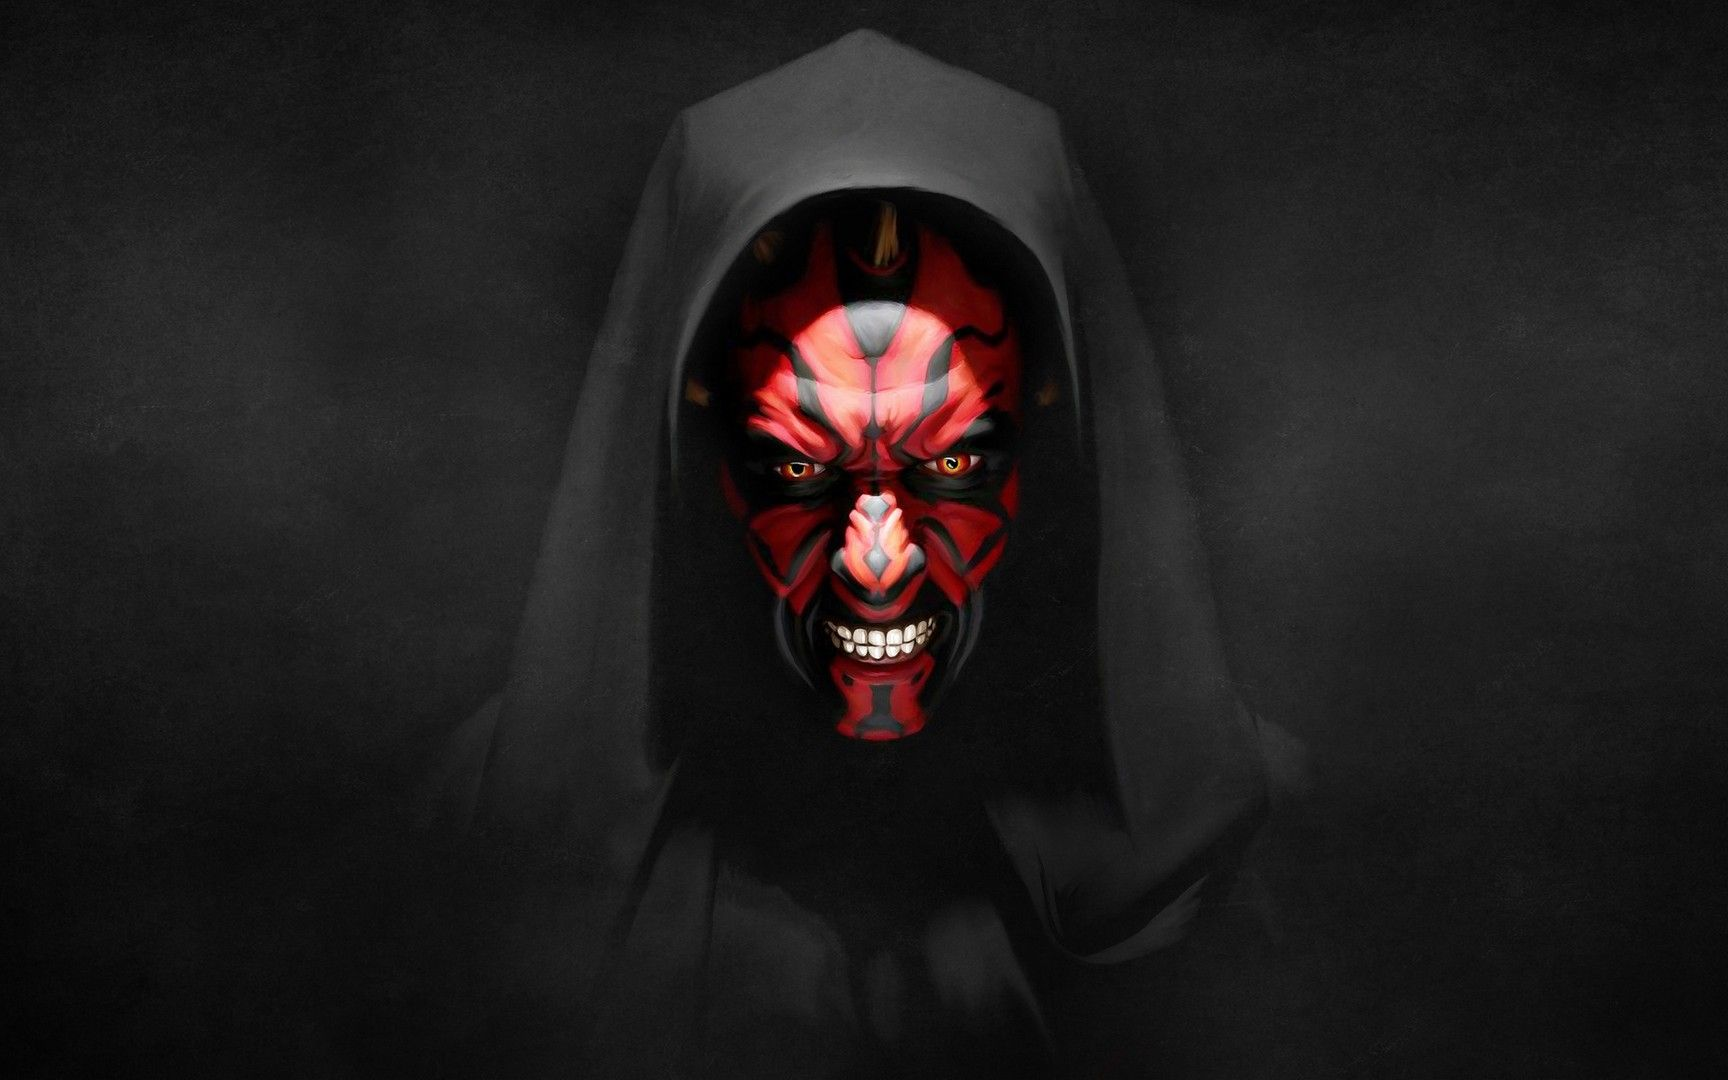 Cool Wallpaper Halloween Star Wars - 027967354cb00bb92454d24190345518  You Should Have_28643.jpg